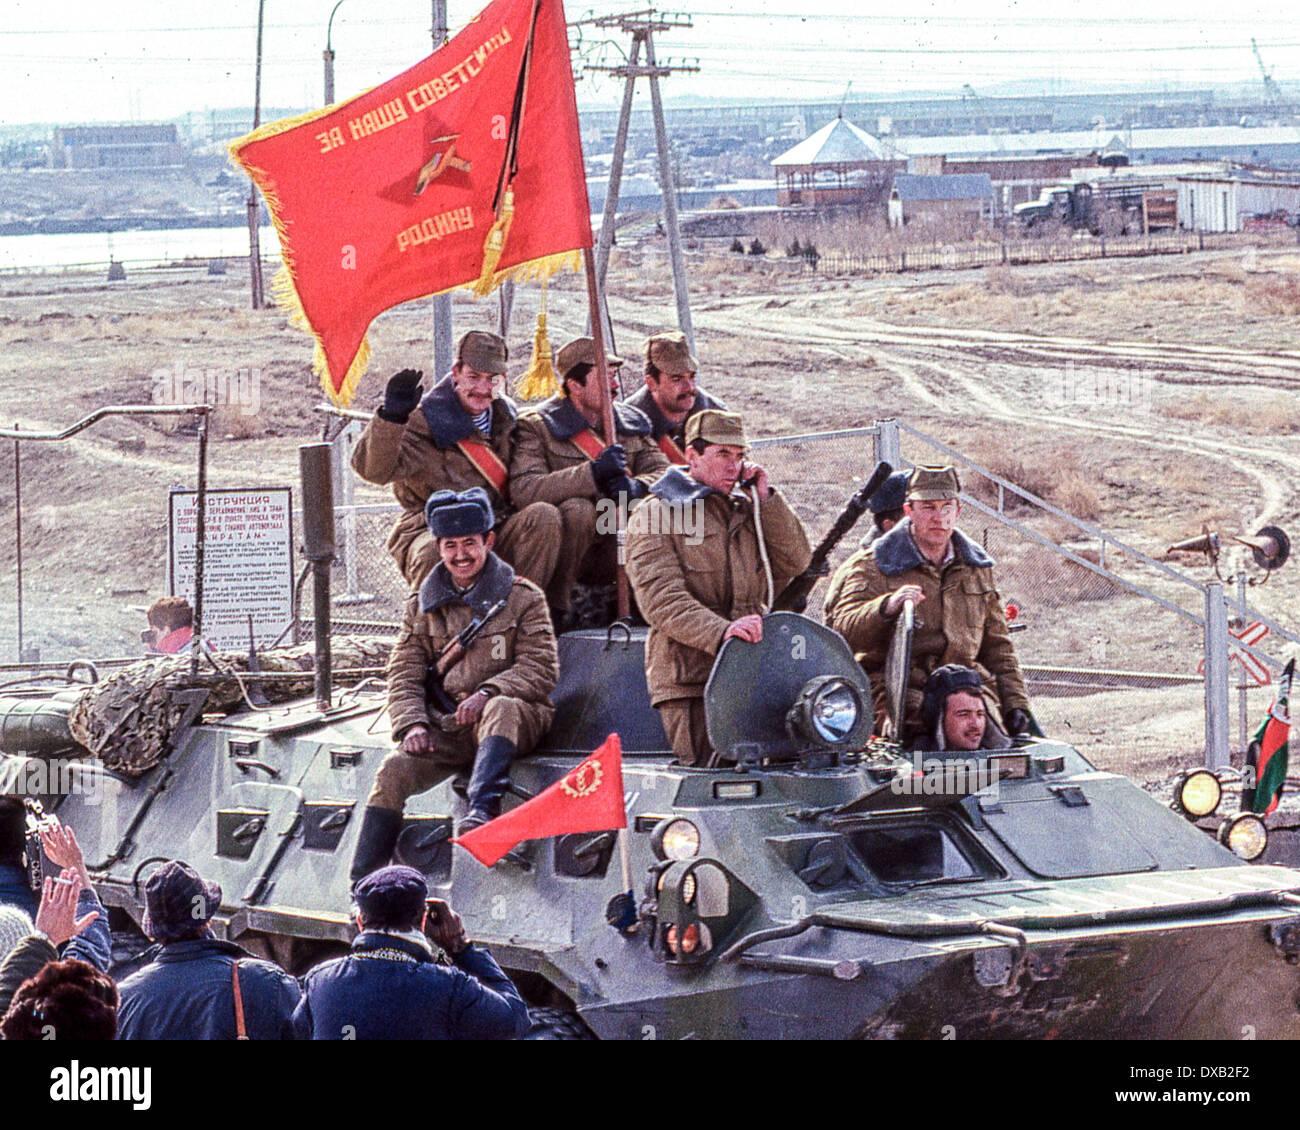 Soviet Afghanistan war - Page 6 Feb-17-1989-termez-uzbekistan-ru-a-soviet-btr-armored-personnel-carrier-DXB2F2